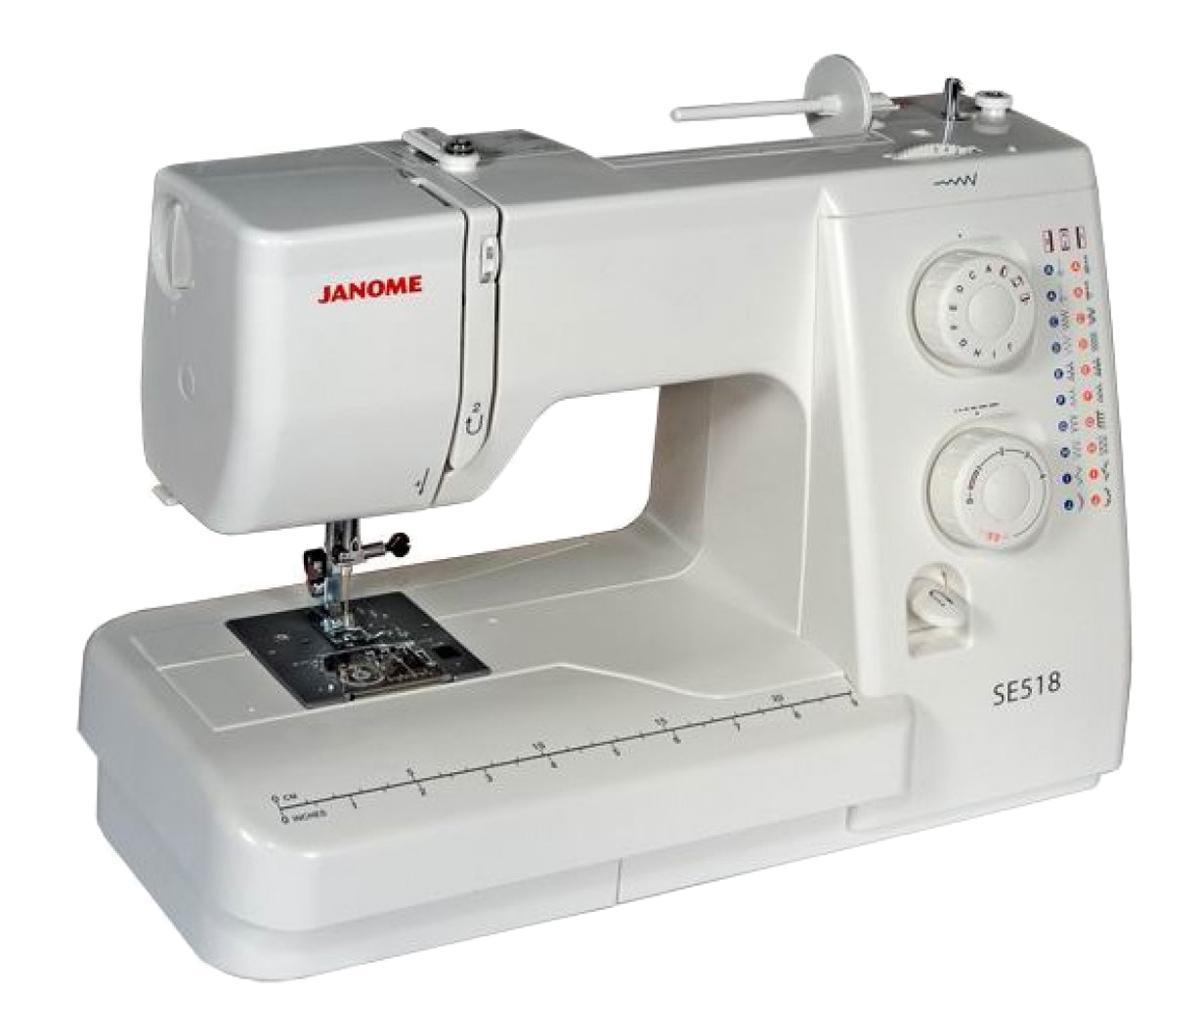 Janome SE 518 швейная машина швейная машина janome dresscode